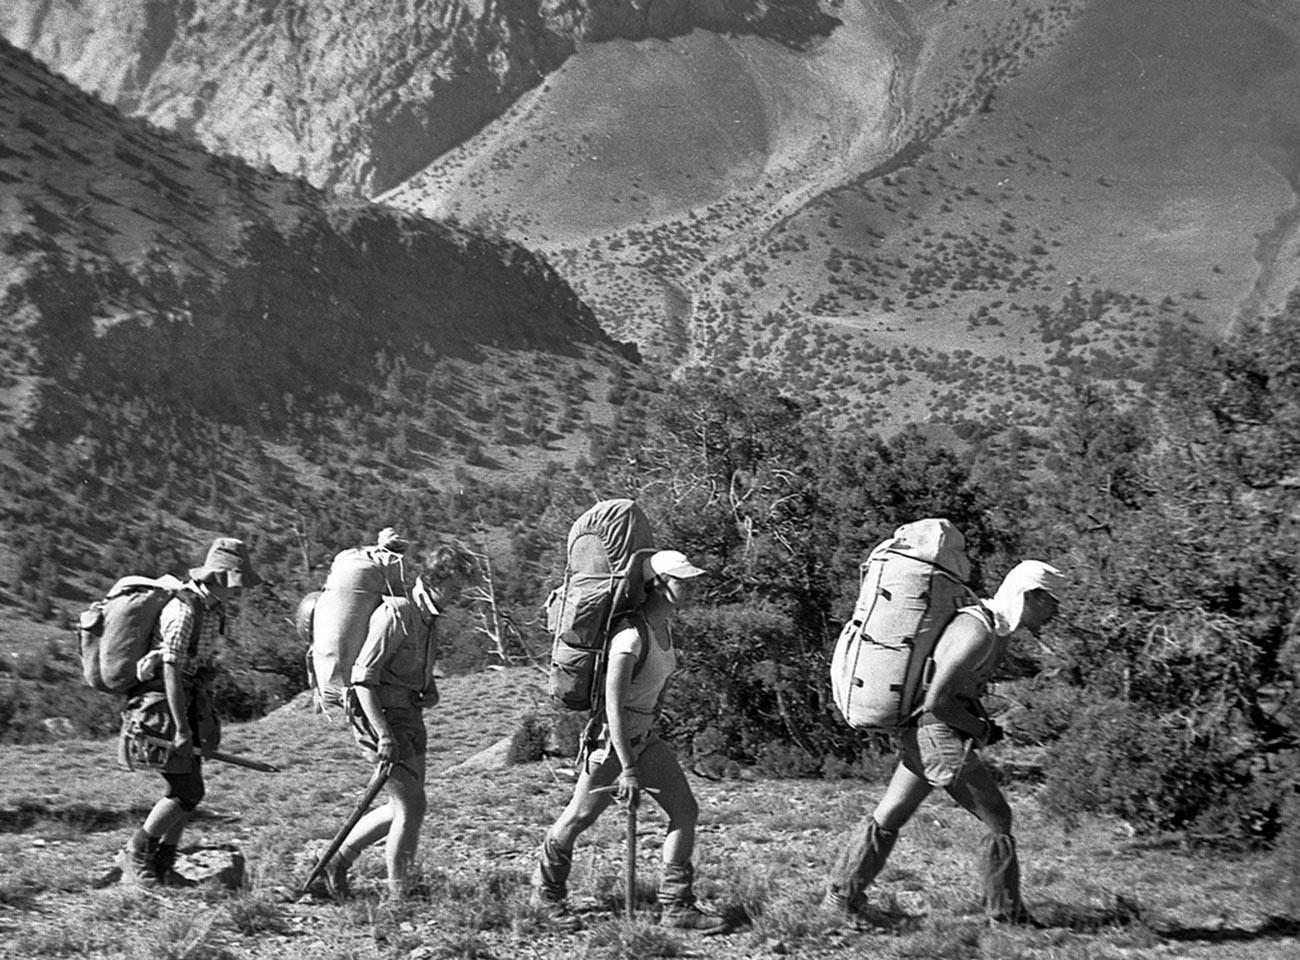 Soviet hikers in Pamir, Tajik SSR; September 3-24, 1986.